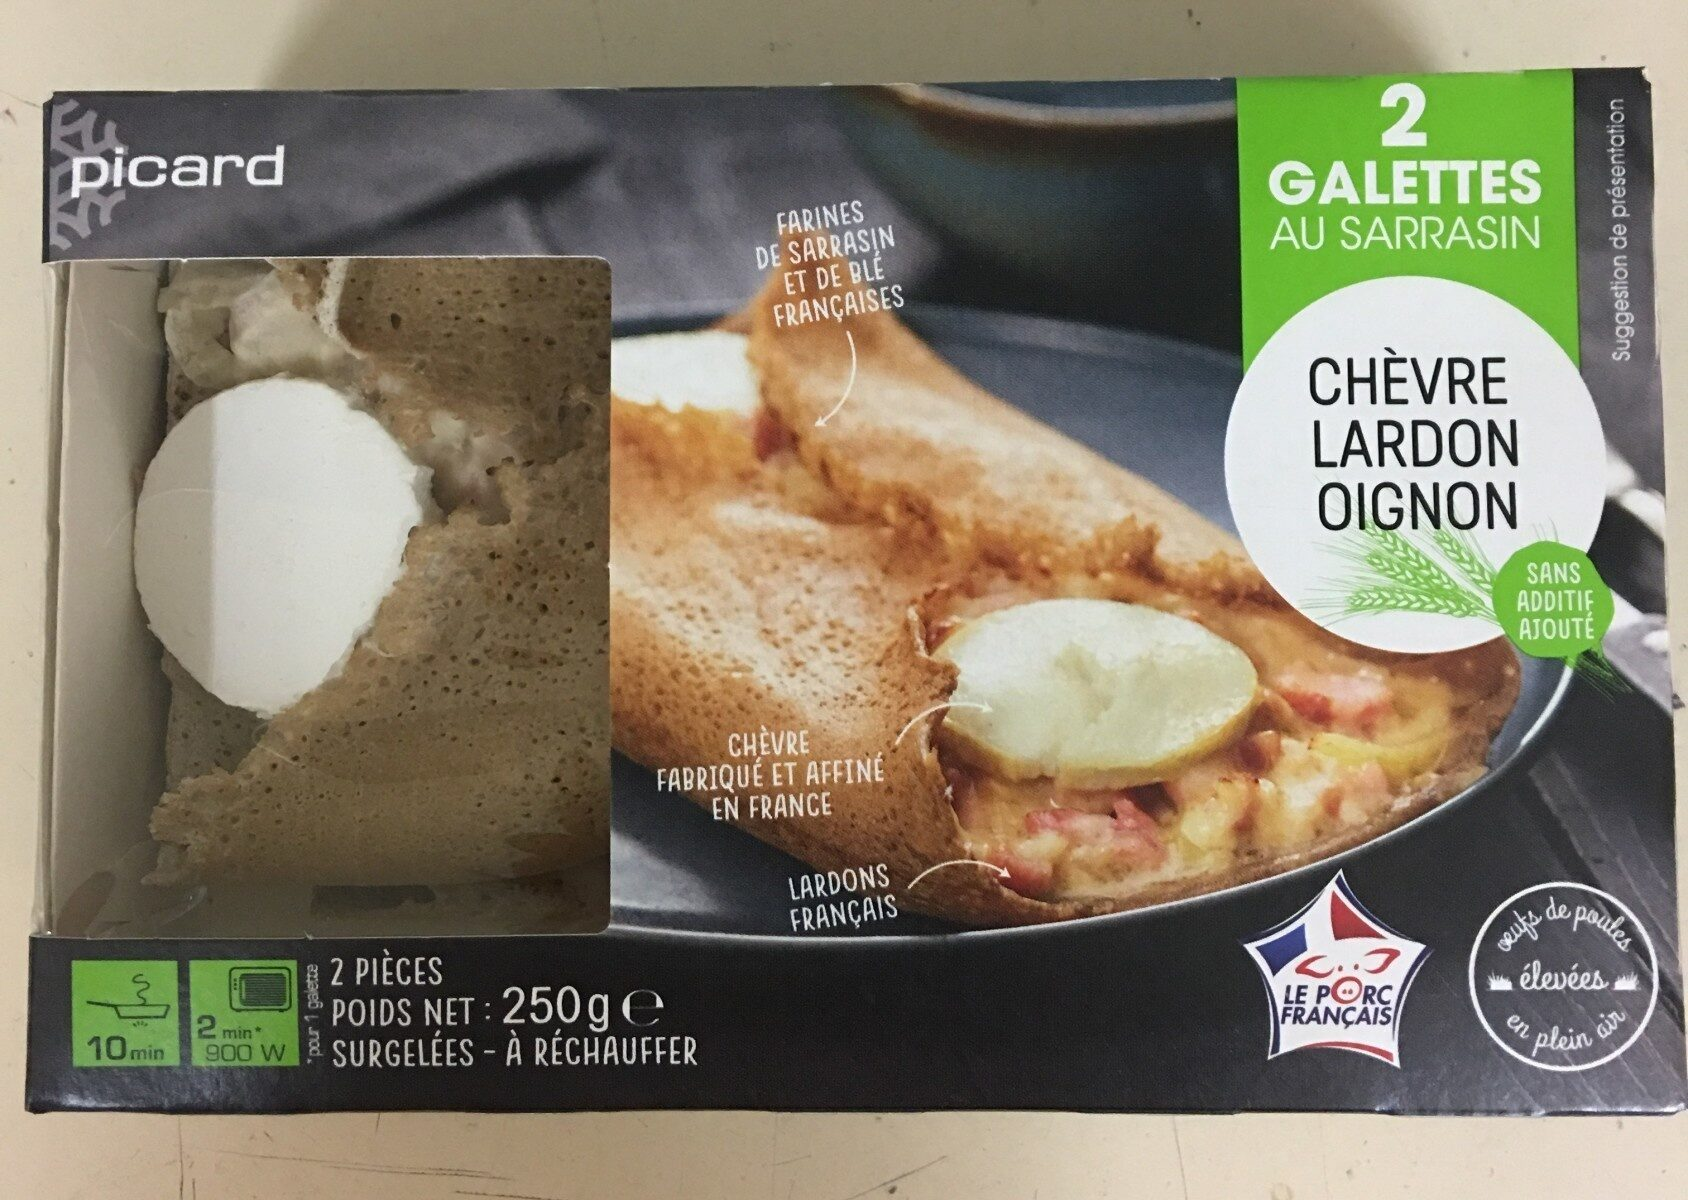 2 galettes chèvre-lardon-oignon - Produit - fr